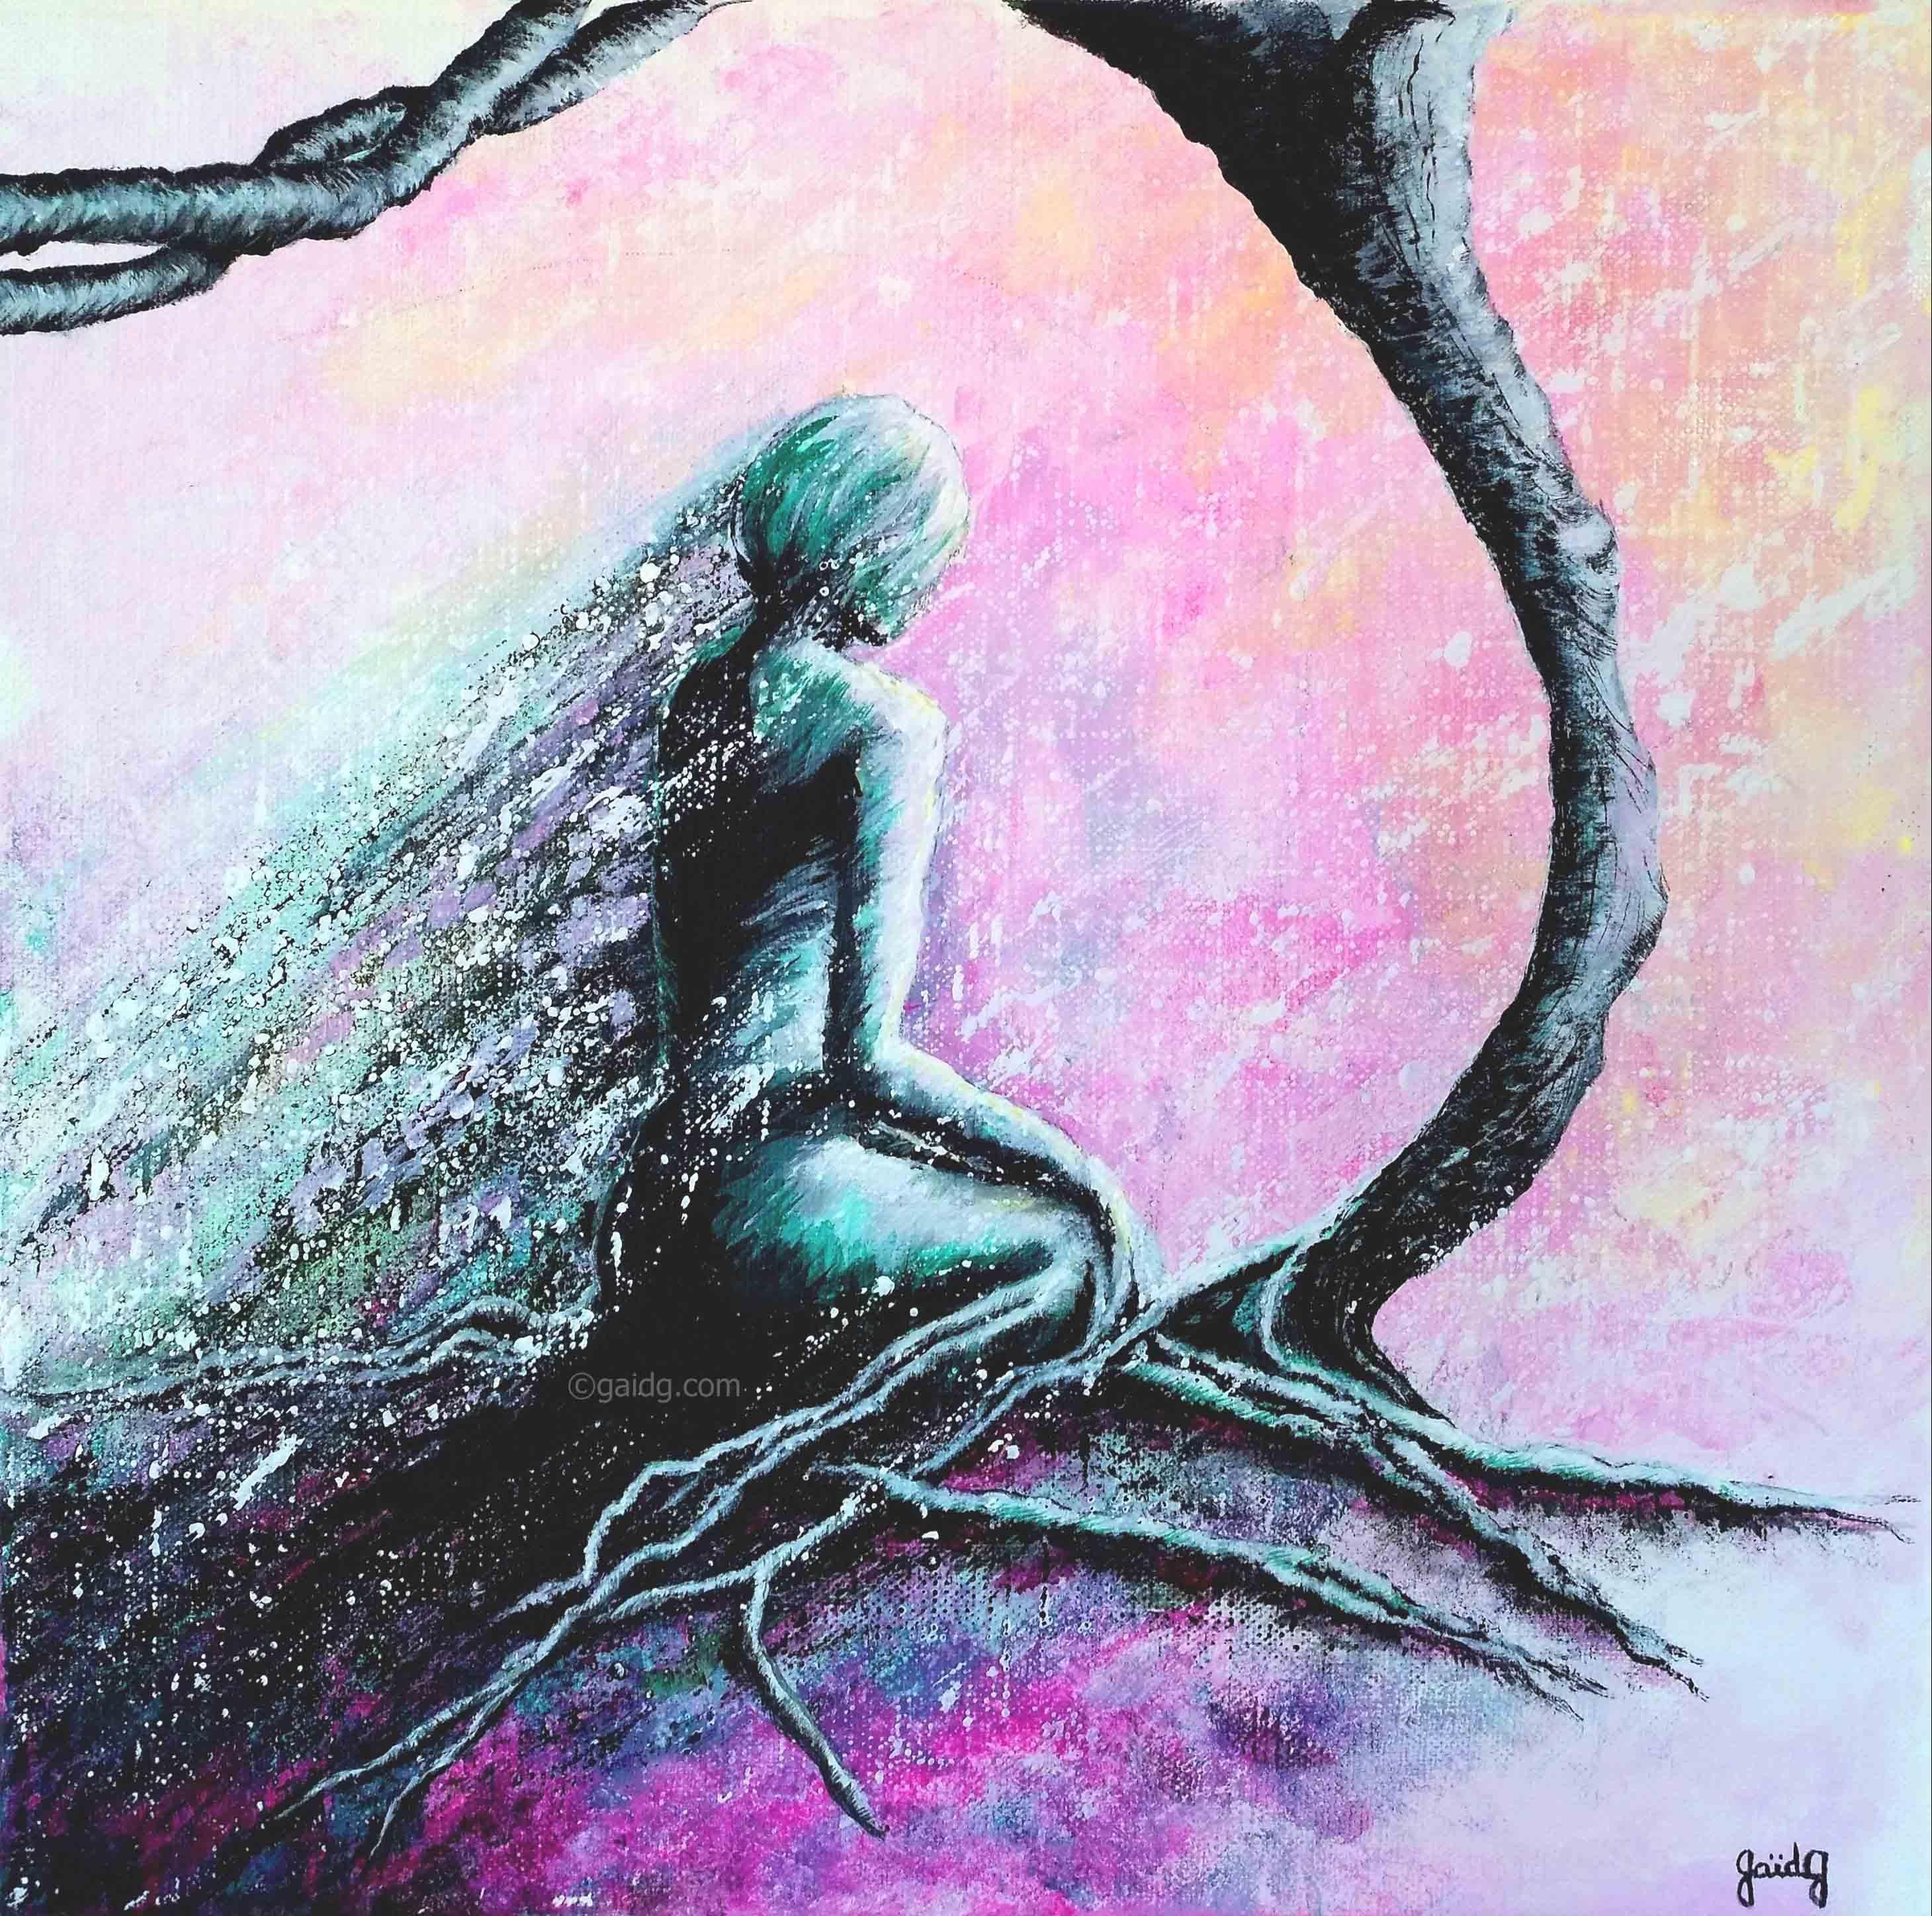 GaidG - Méditation - 30x30 cm